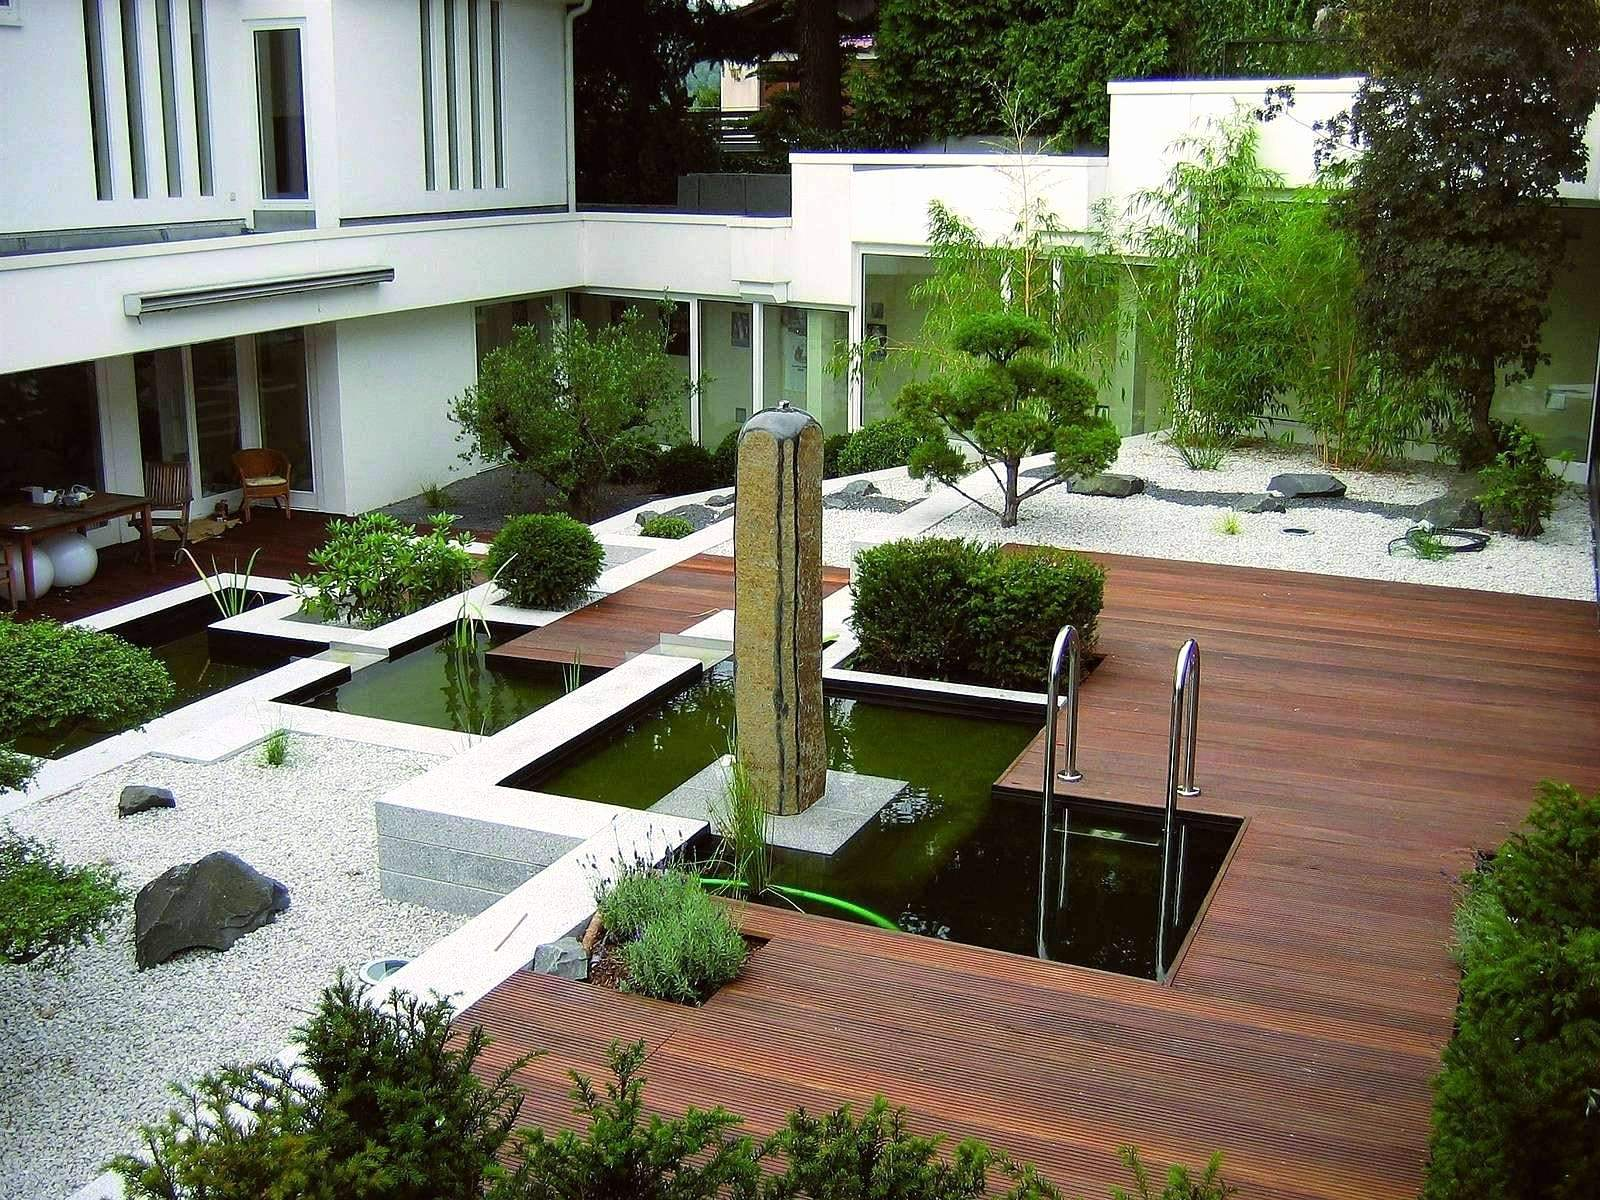 garten terrasse ideen inspirierend terrasse anlegen ideen neu pool anlegen garten swimmingpool of garten terrasse ideen